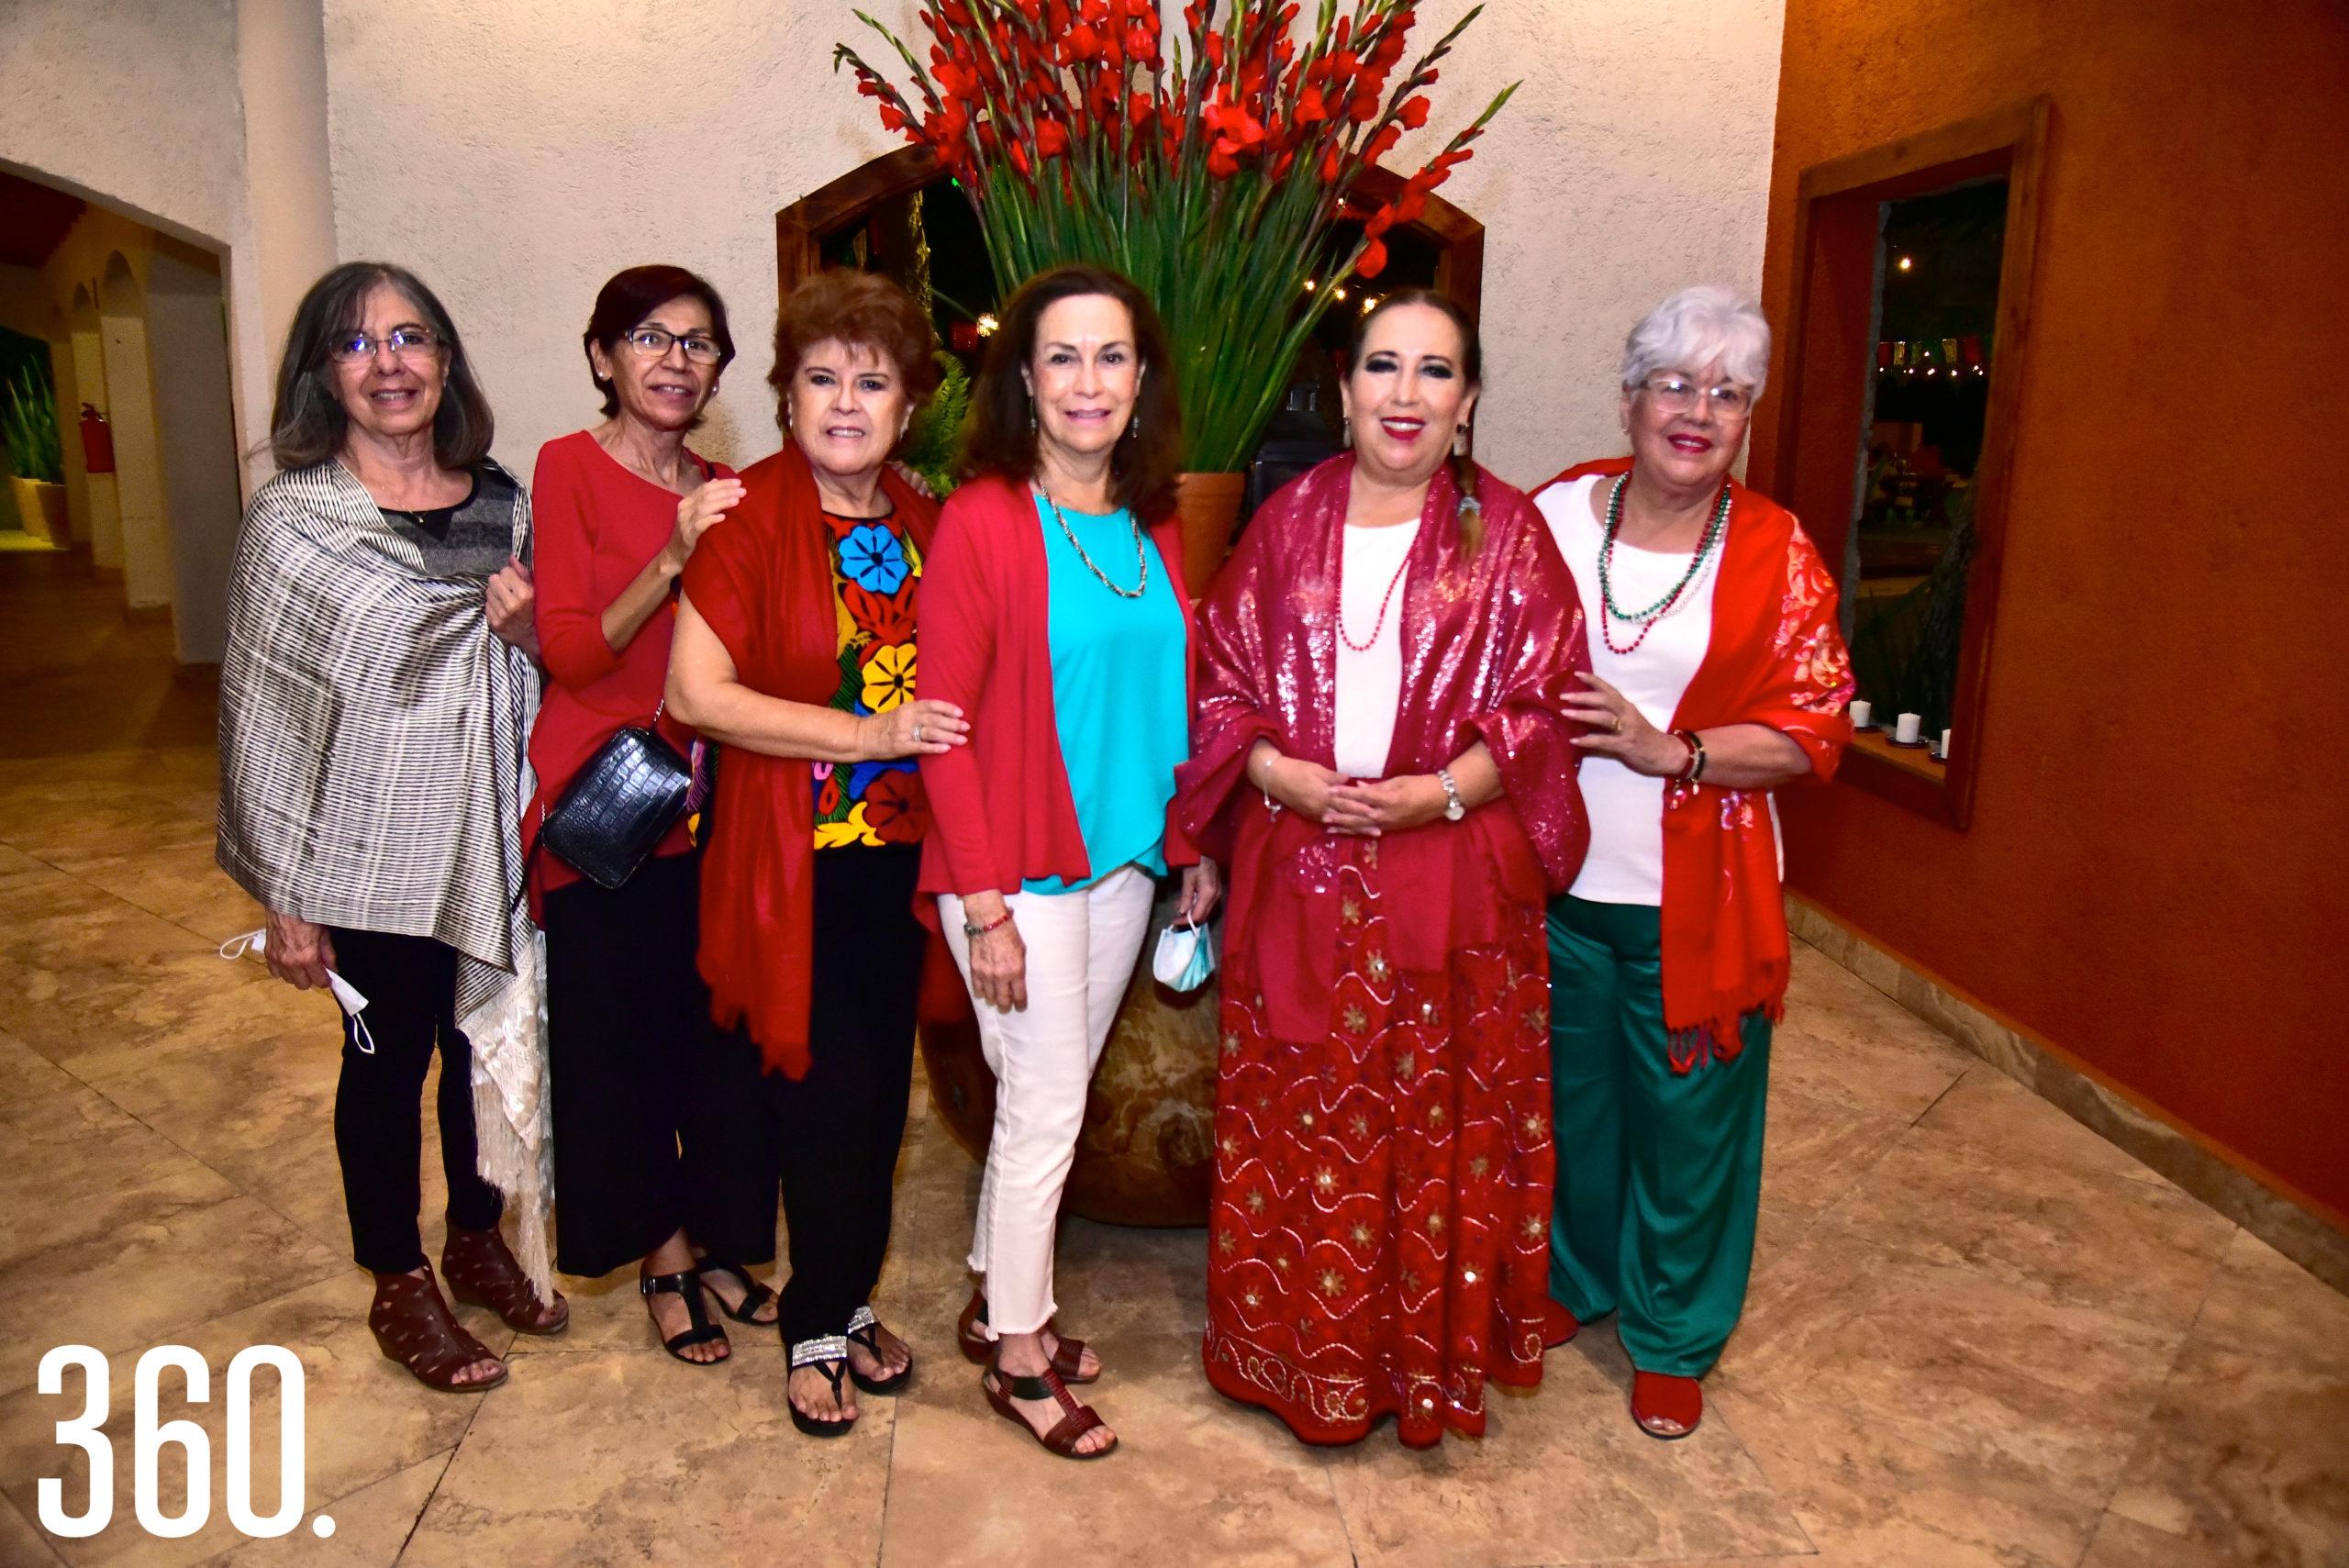 Patricia Morales, Palmira Guevara, Mari Jiménez, Cristina Sosa, Juanita Ramos y Minerva Gutiérrez.